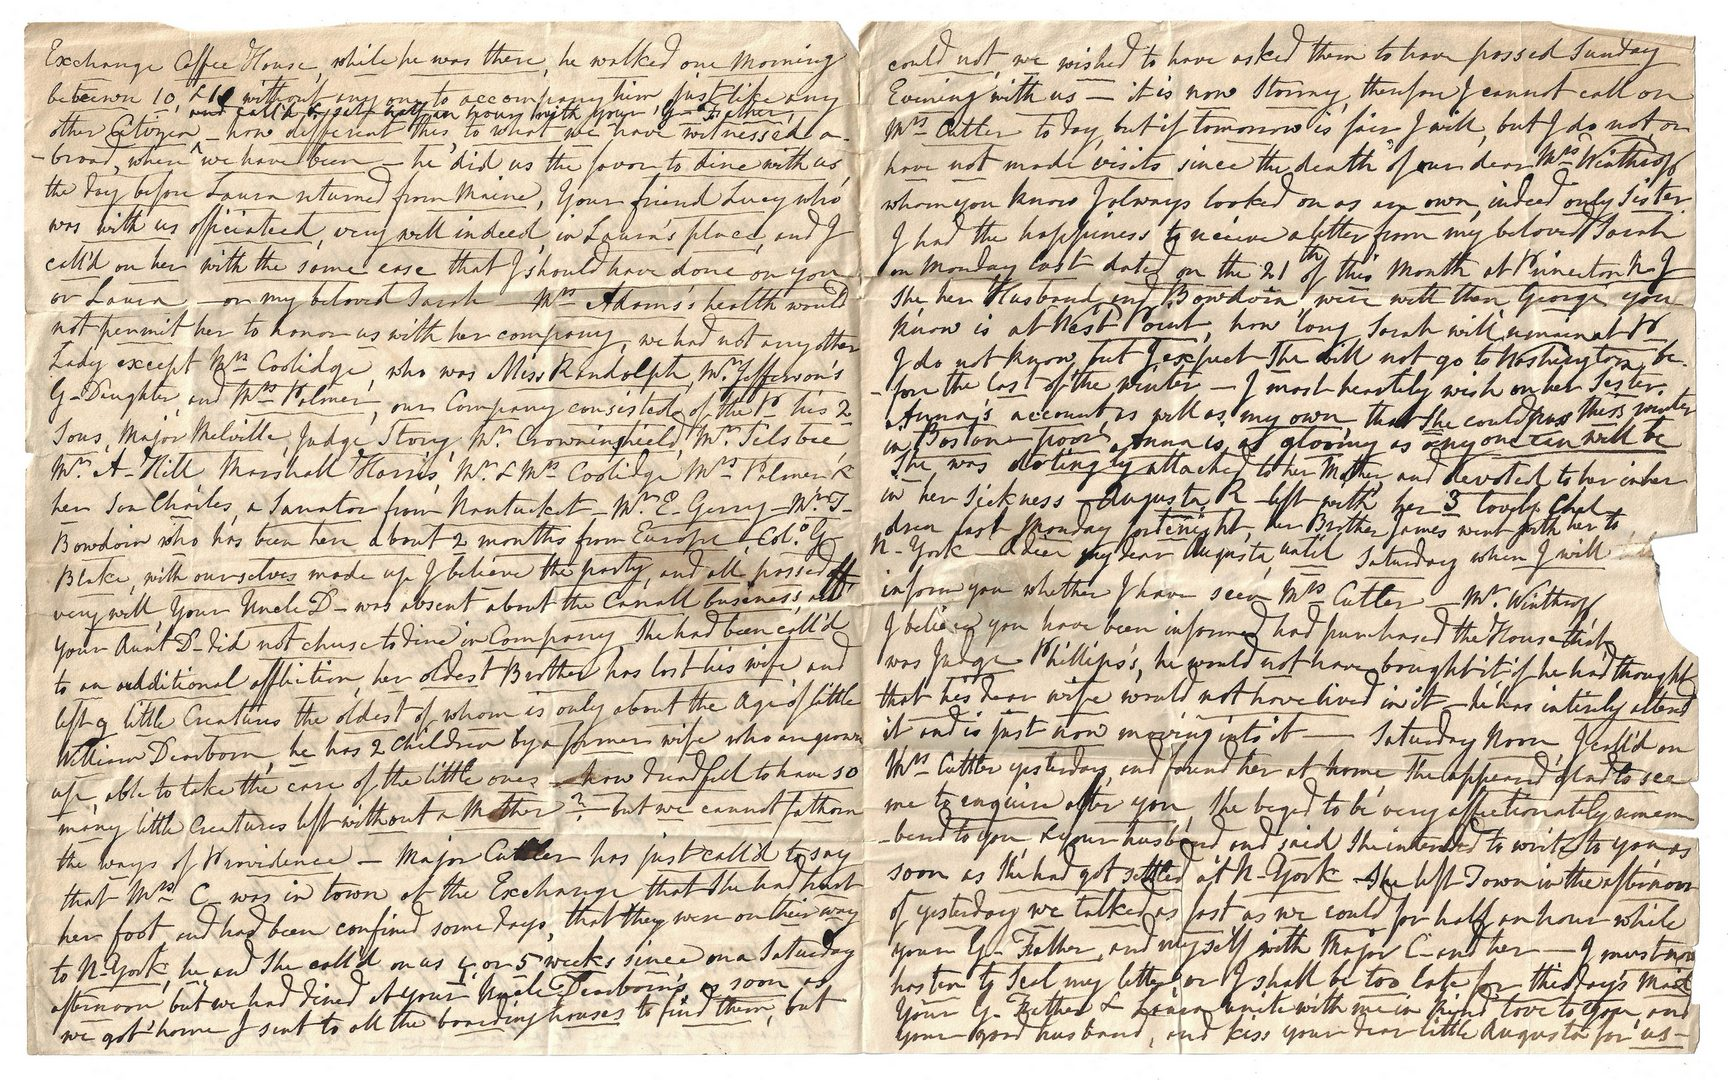 Lot 264: Dearborn Family Letter Archive inc. Gen. Henry Dearborn signature